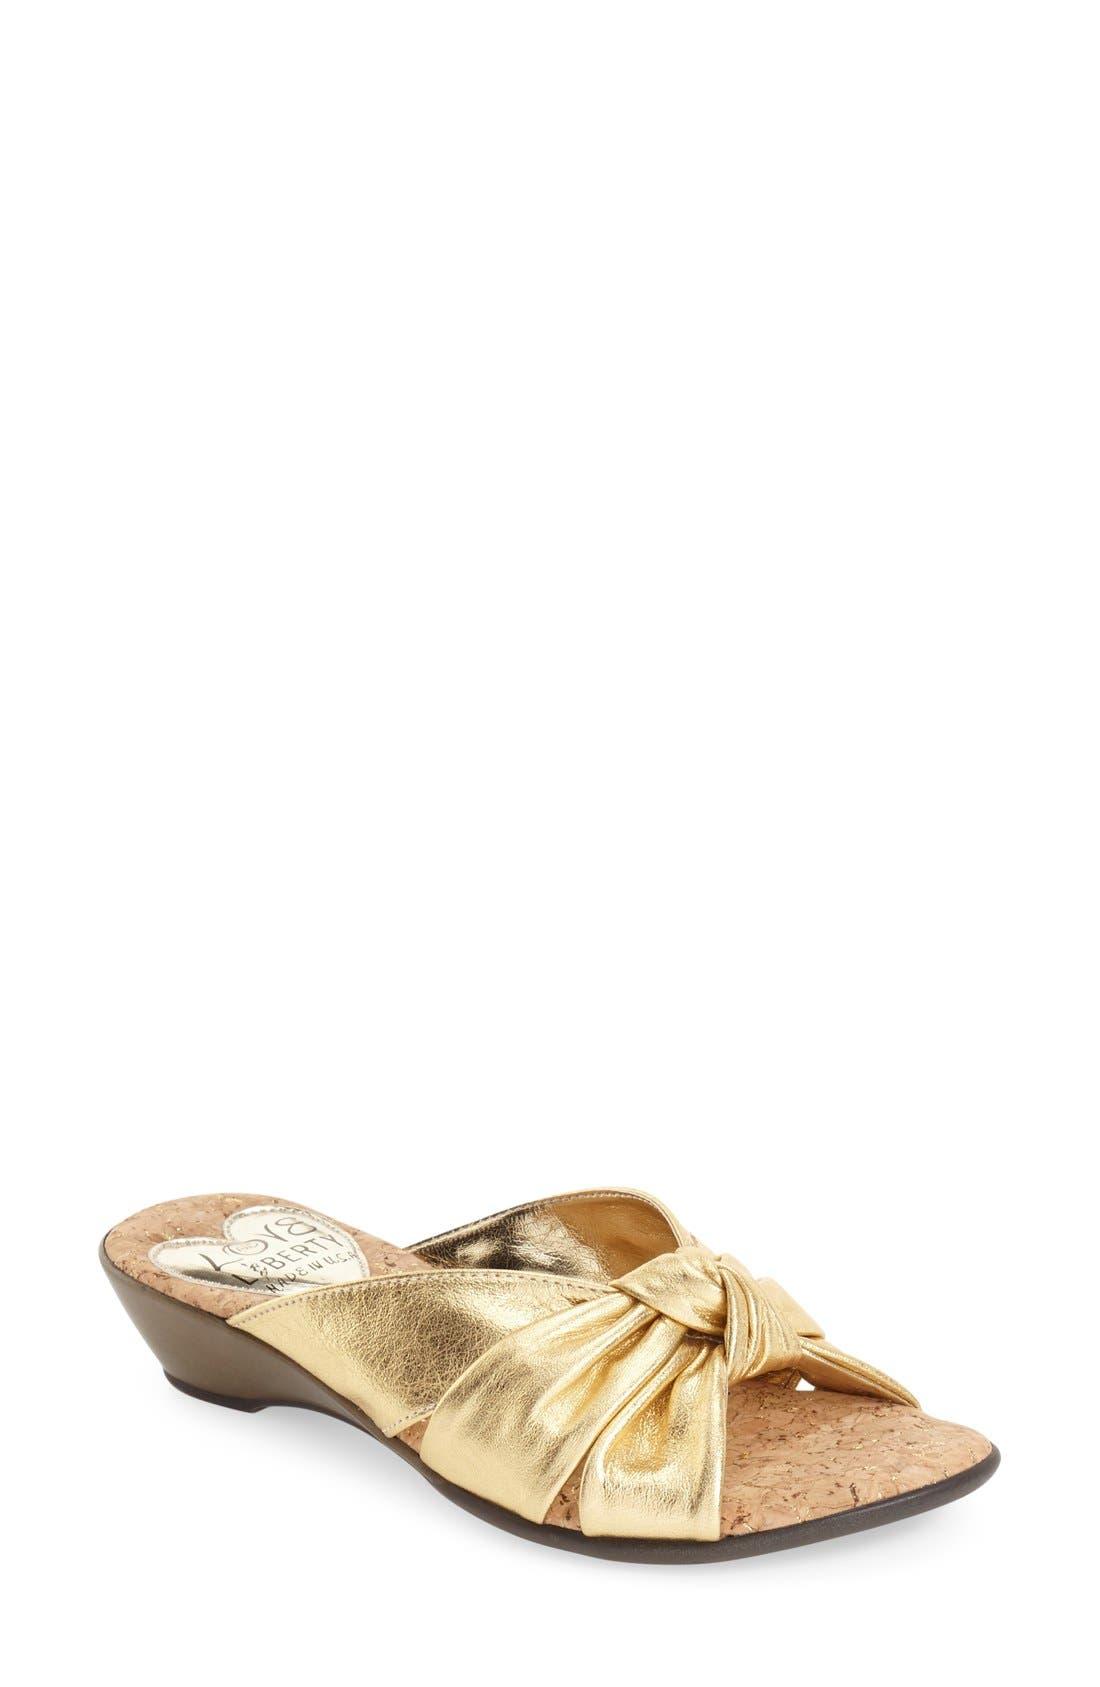 LOVE AND LIBERTY 'Janet' Slide Sandal